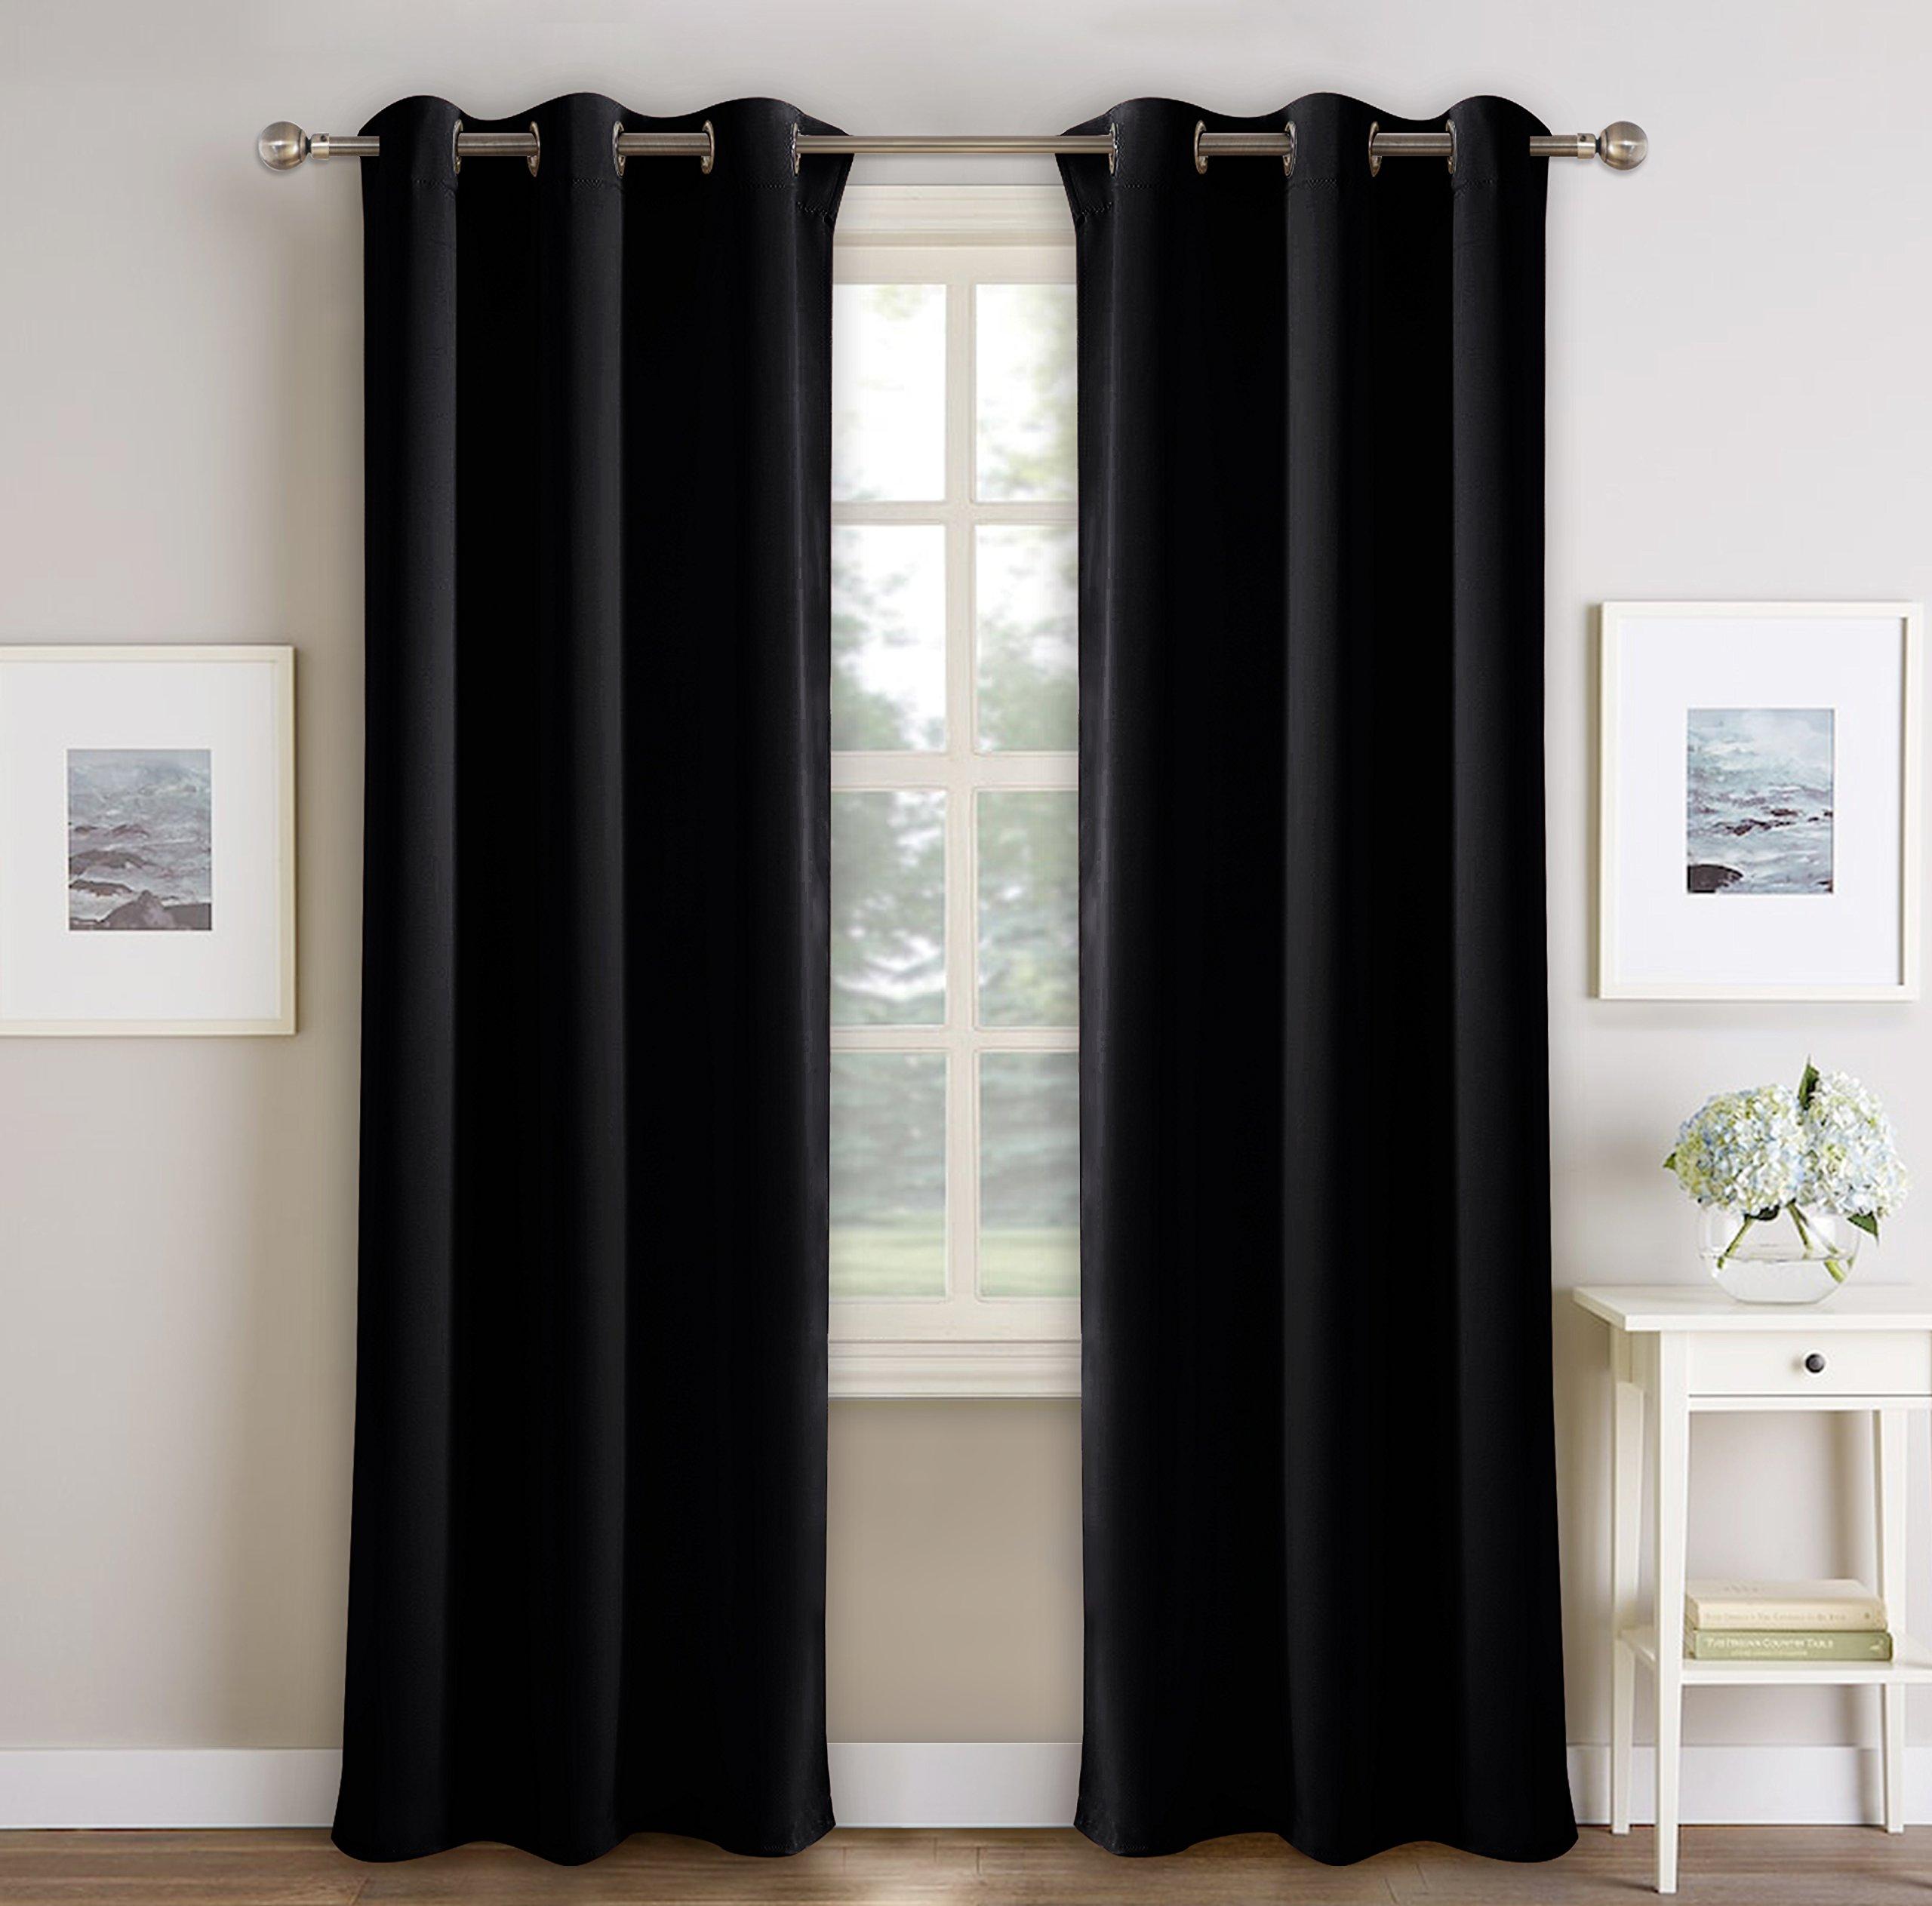 PONY DANCE Blackout Curtain Drapes